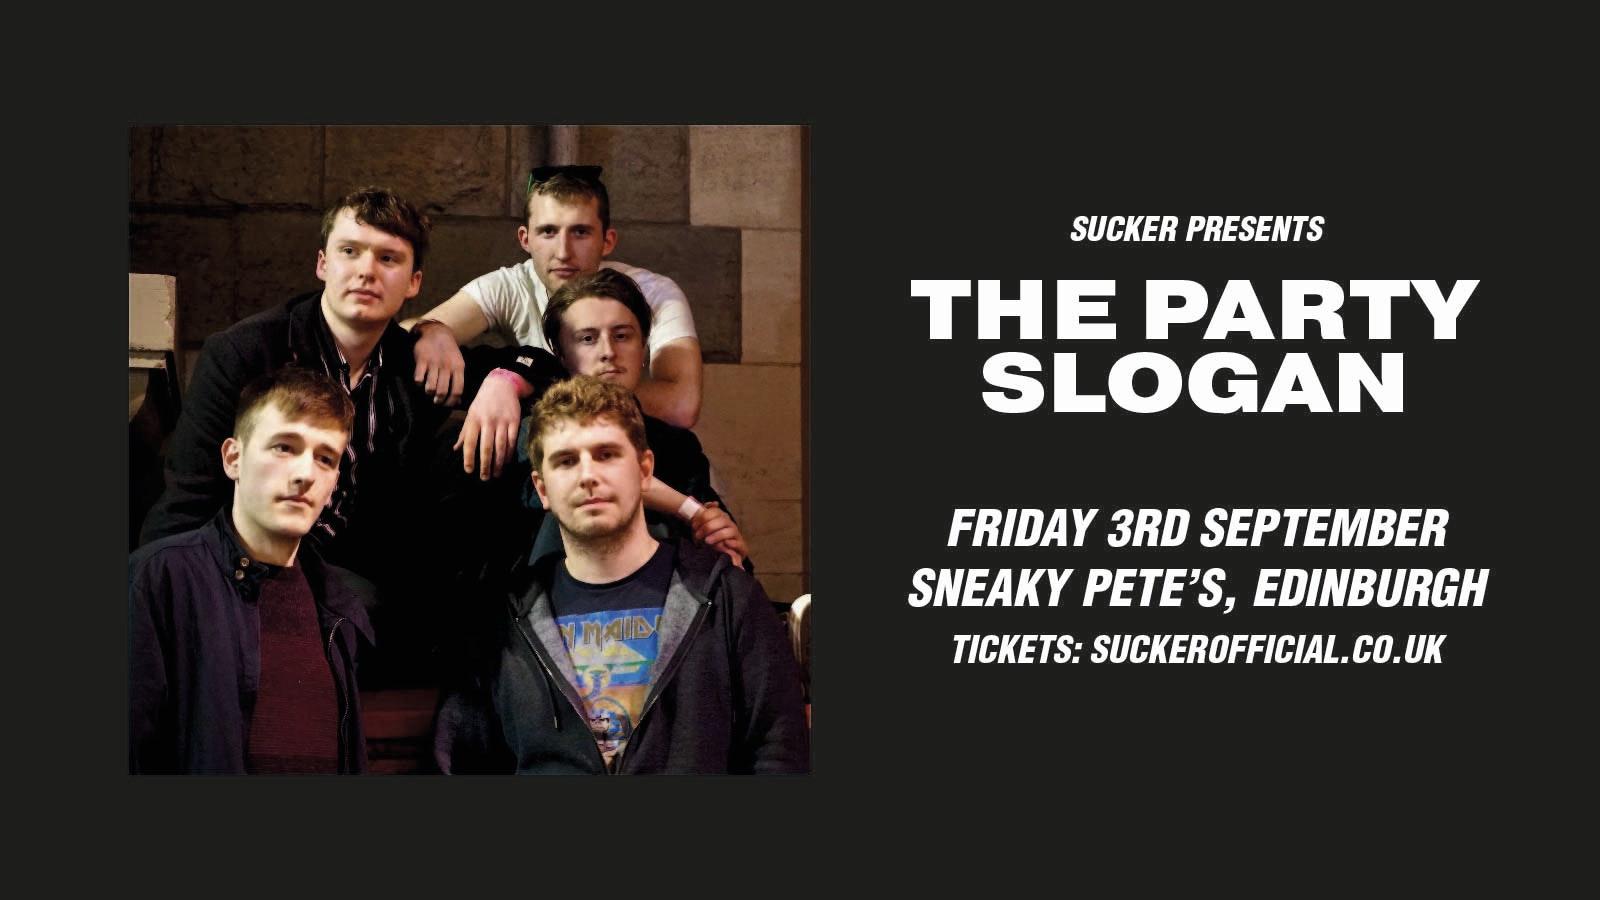 The Party Slogan at Sneaky Pete's, Edinburgh